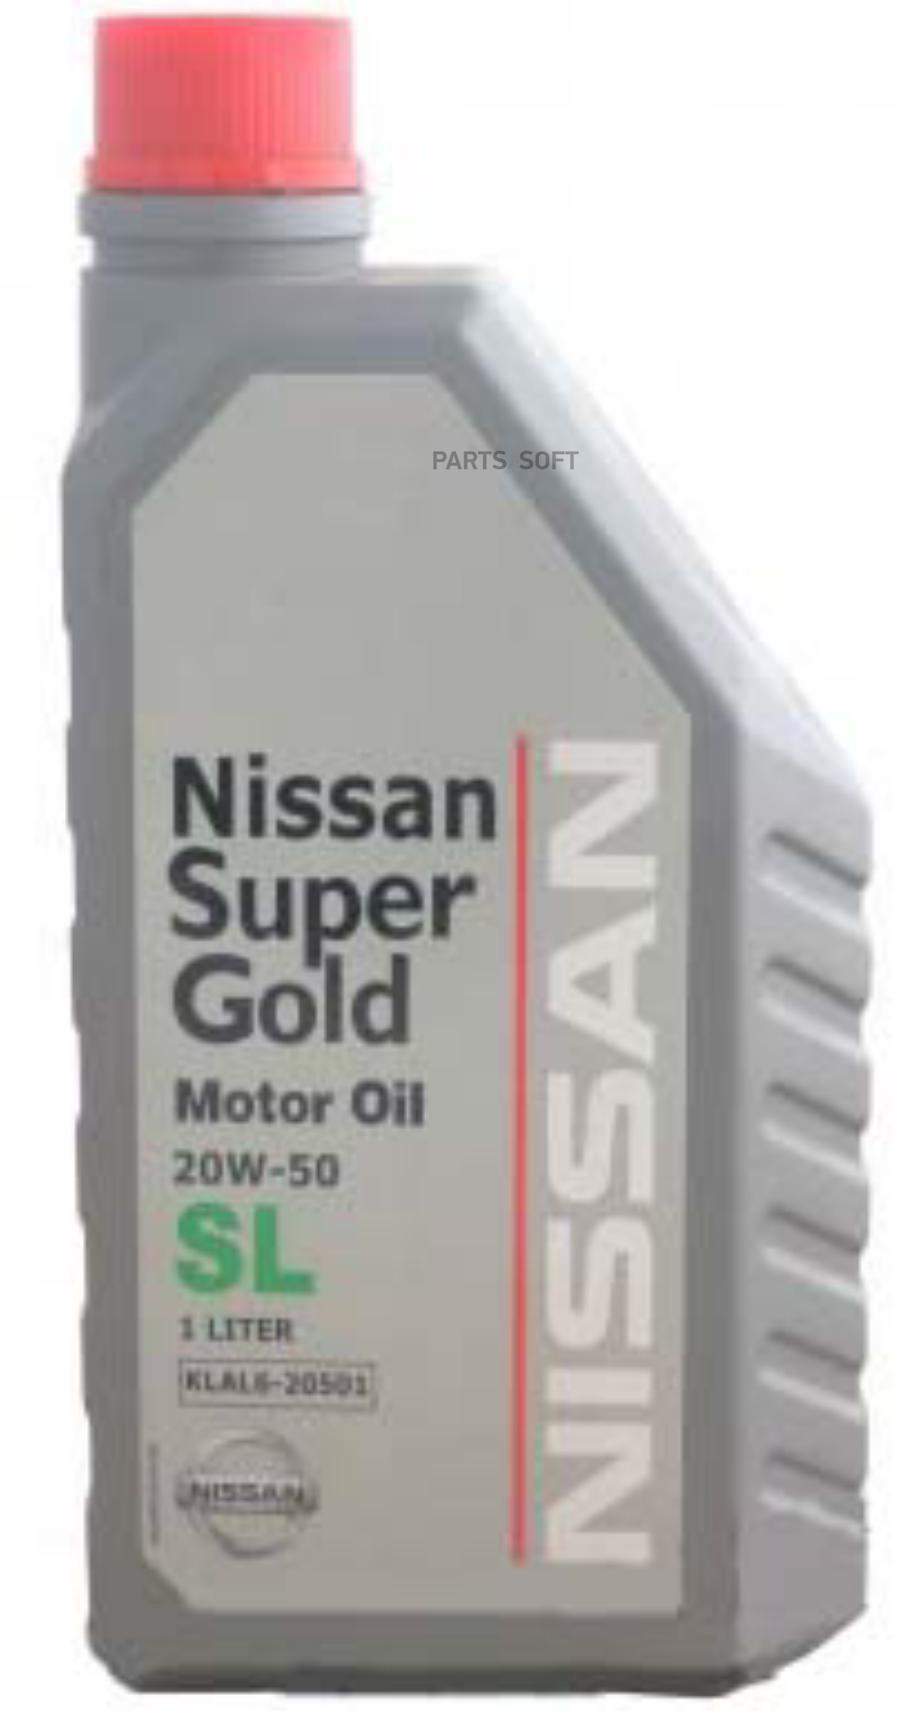 Nissan Super Gold 20W50 SL .